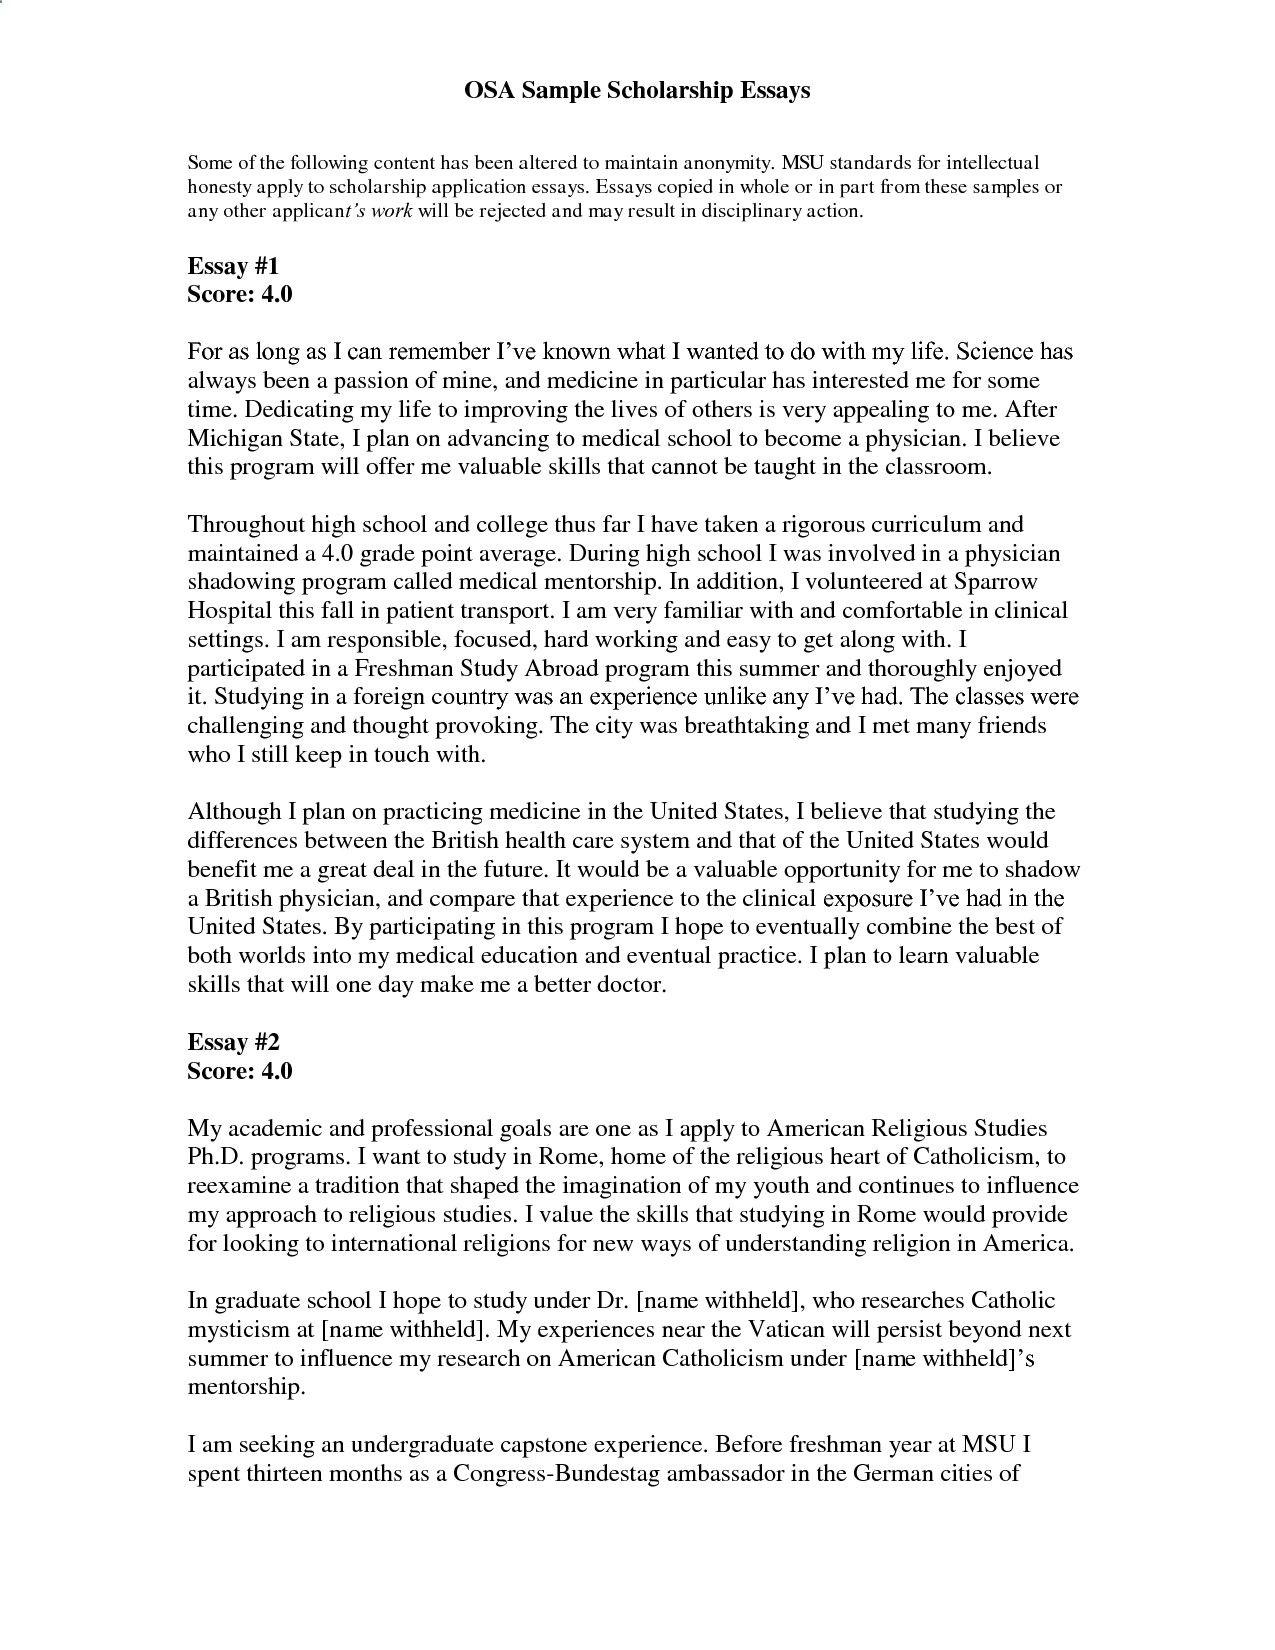 Research performance metrics services llc center